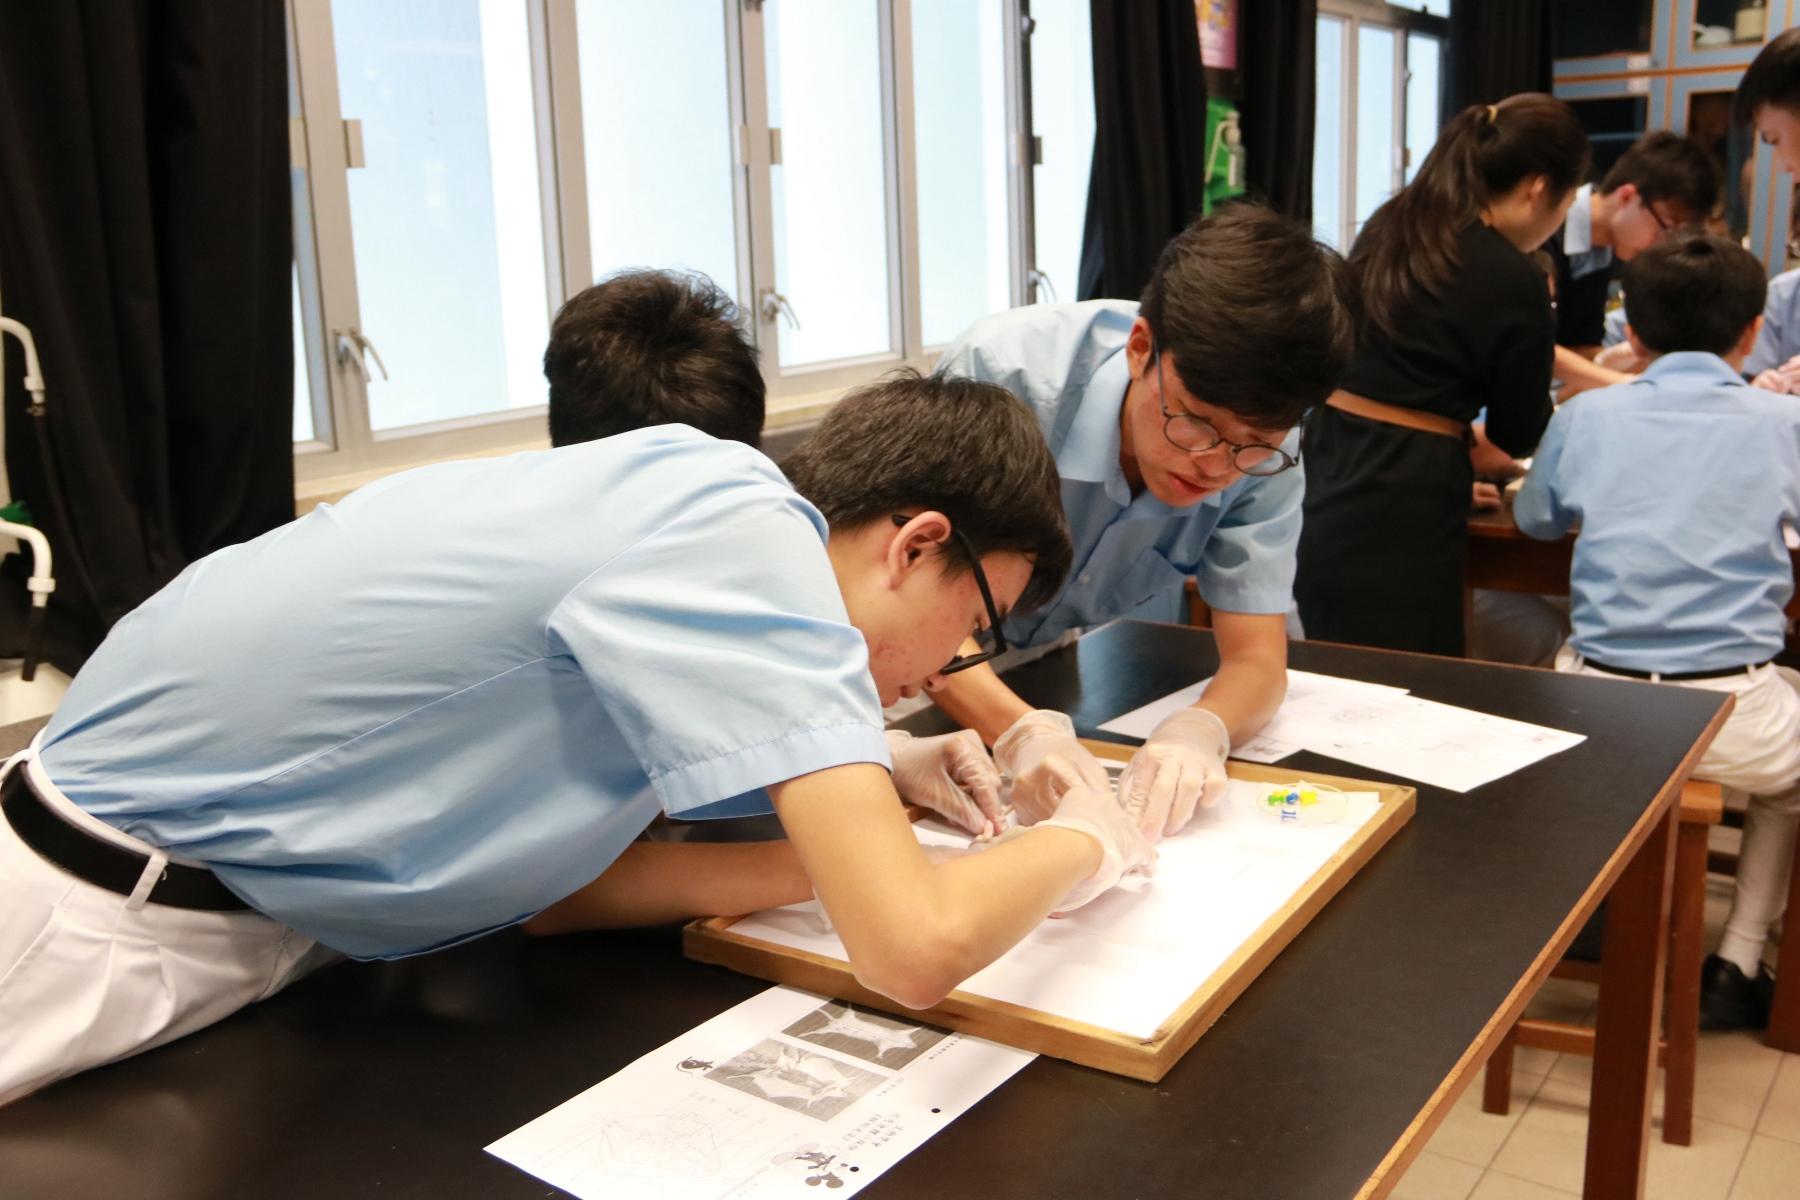 http://www.npc.edu.hk/sites/default/files/img_7407.jpg